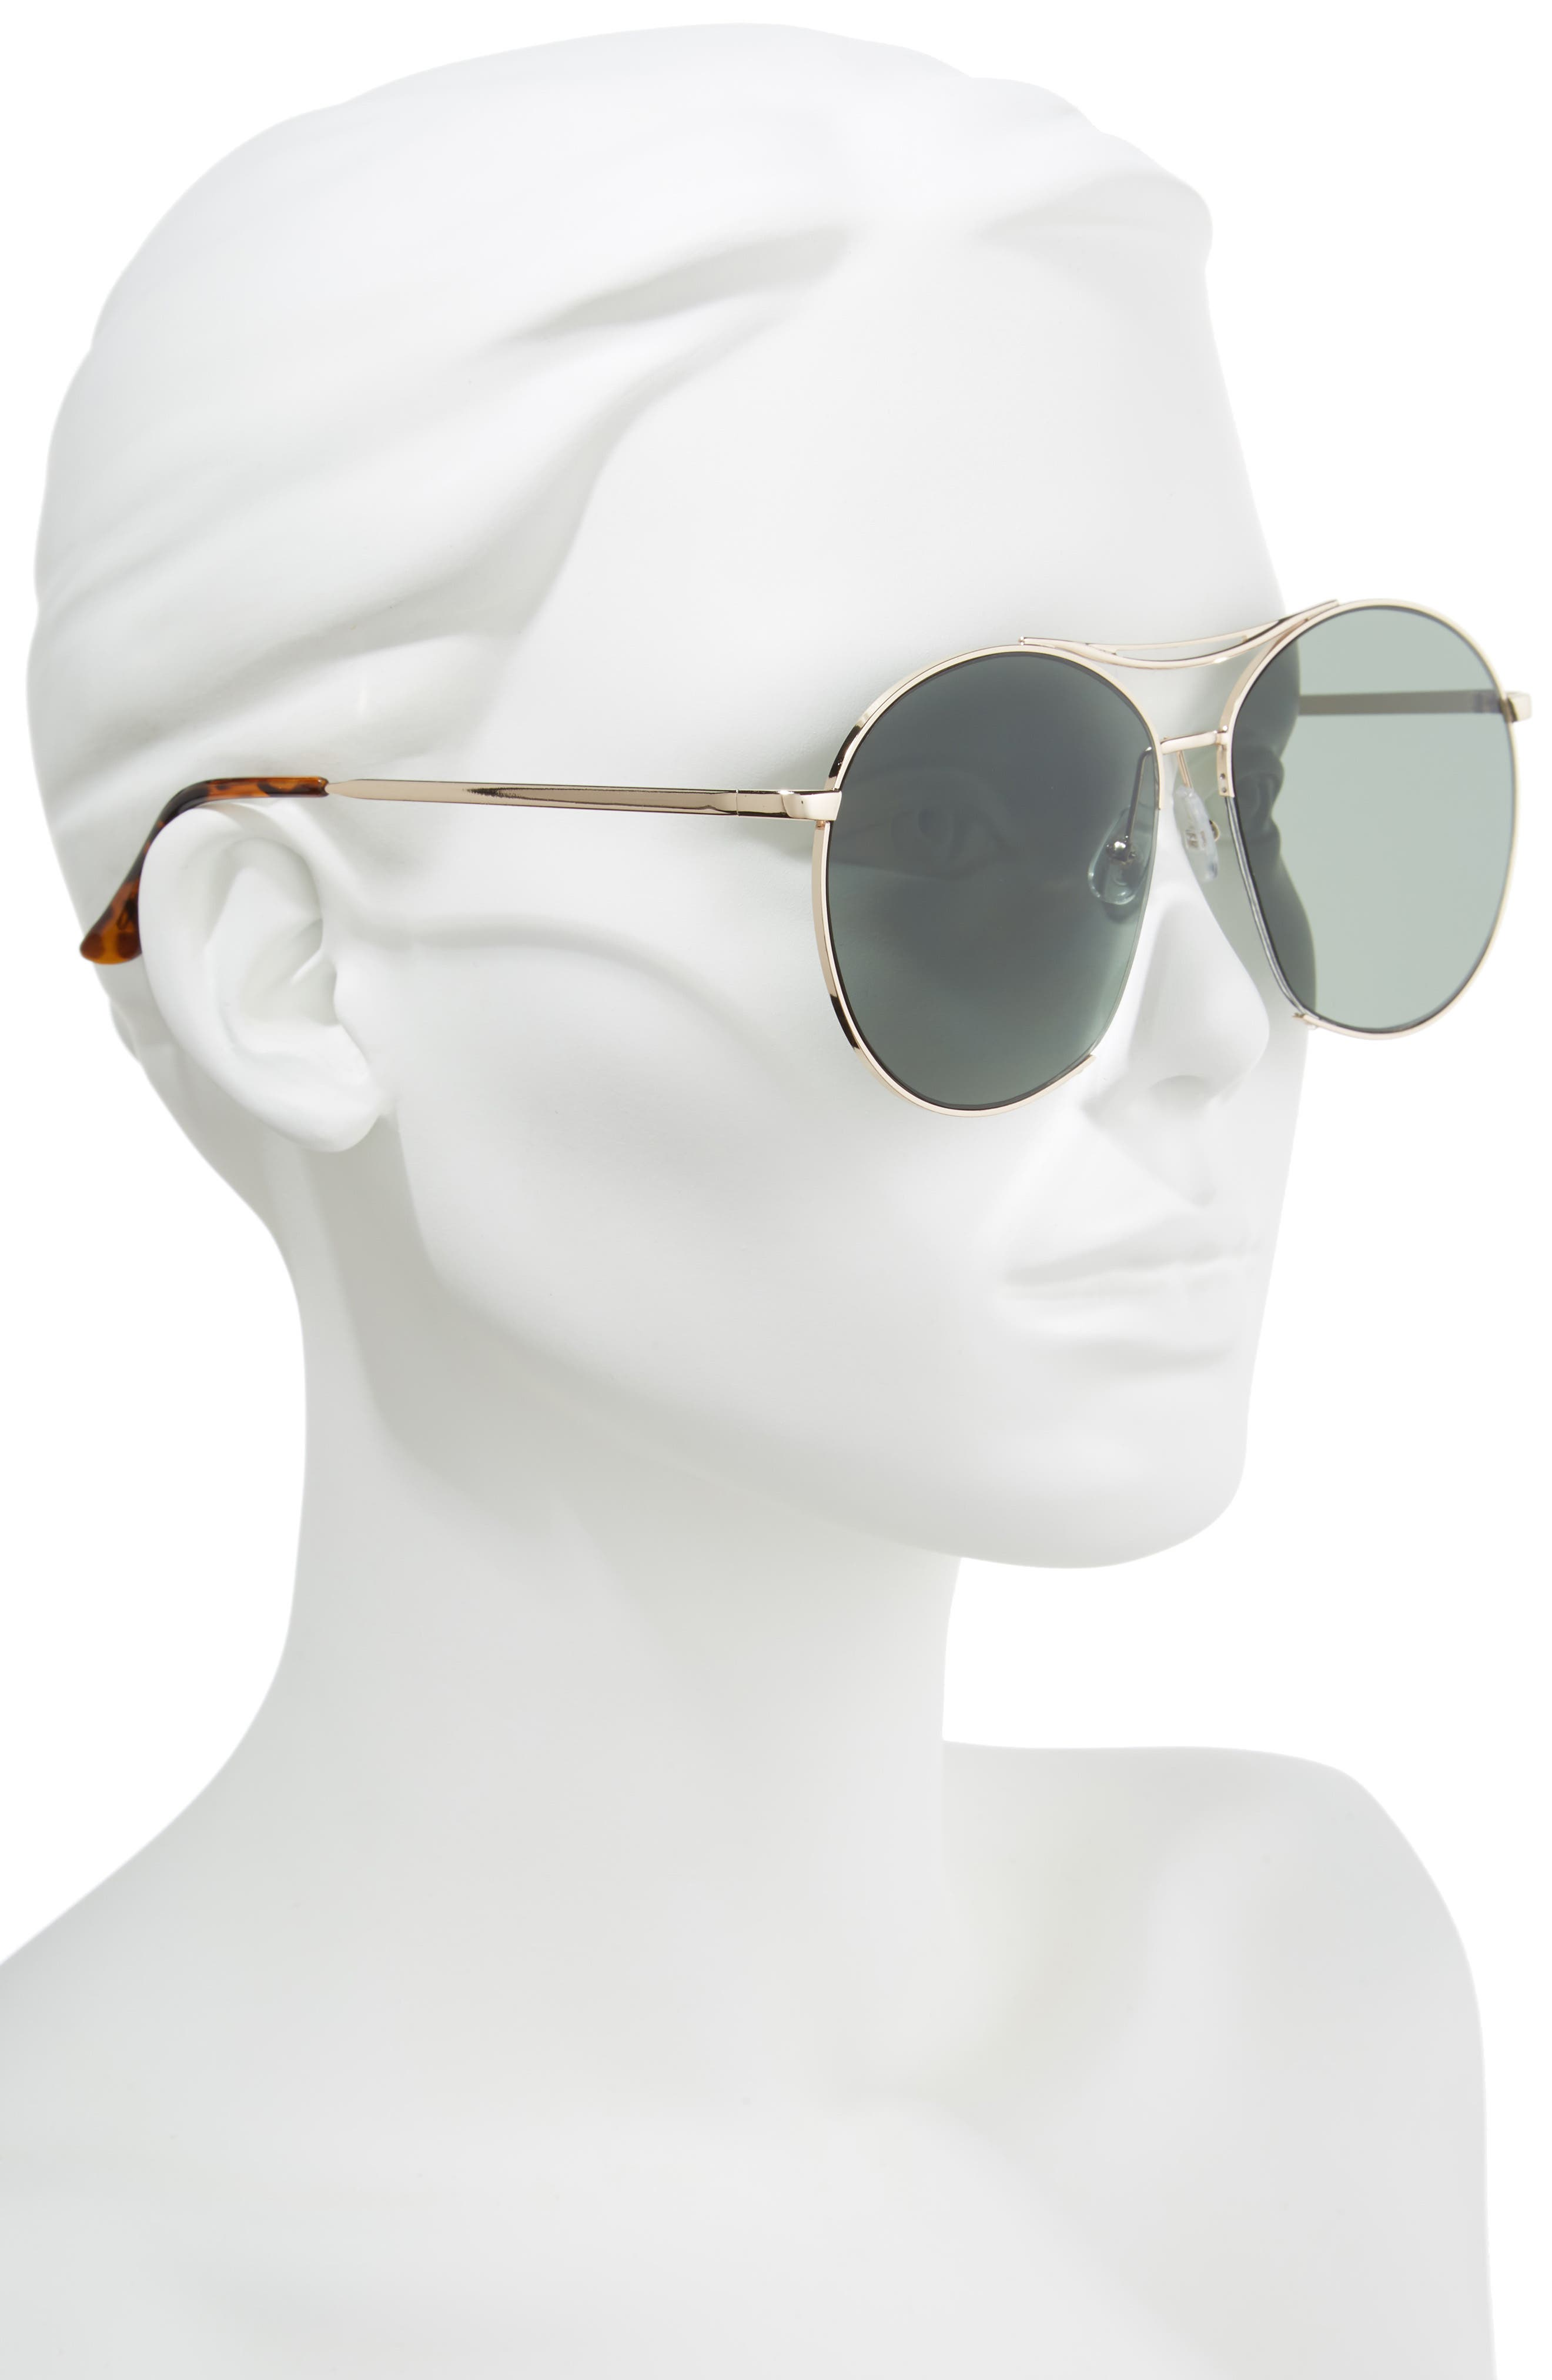 60mm Round Aviator Sunglasses,                             Alternate thumbnail 2, color,                             710